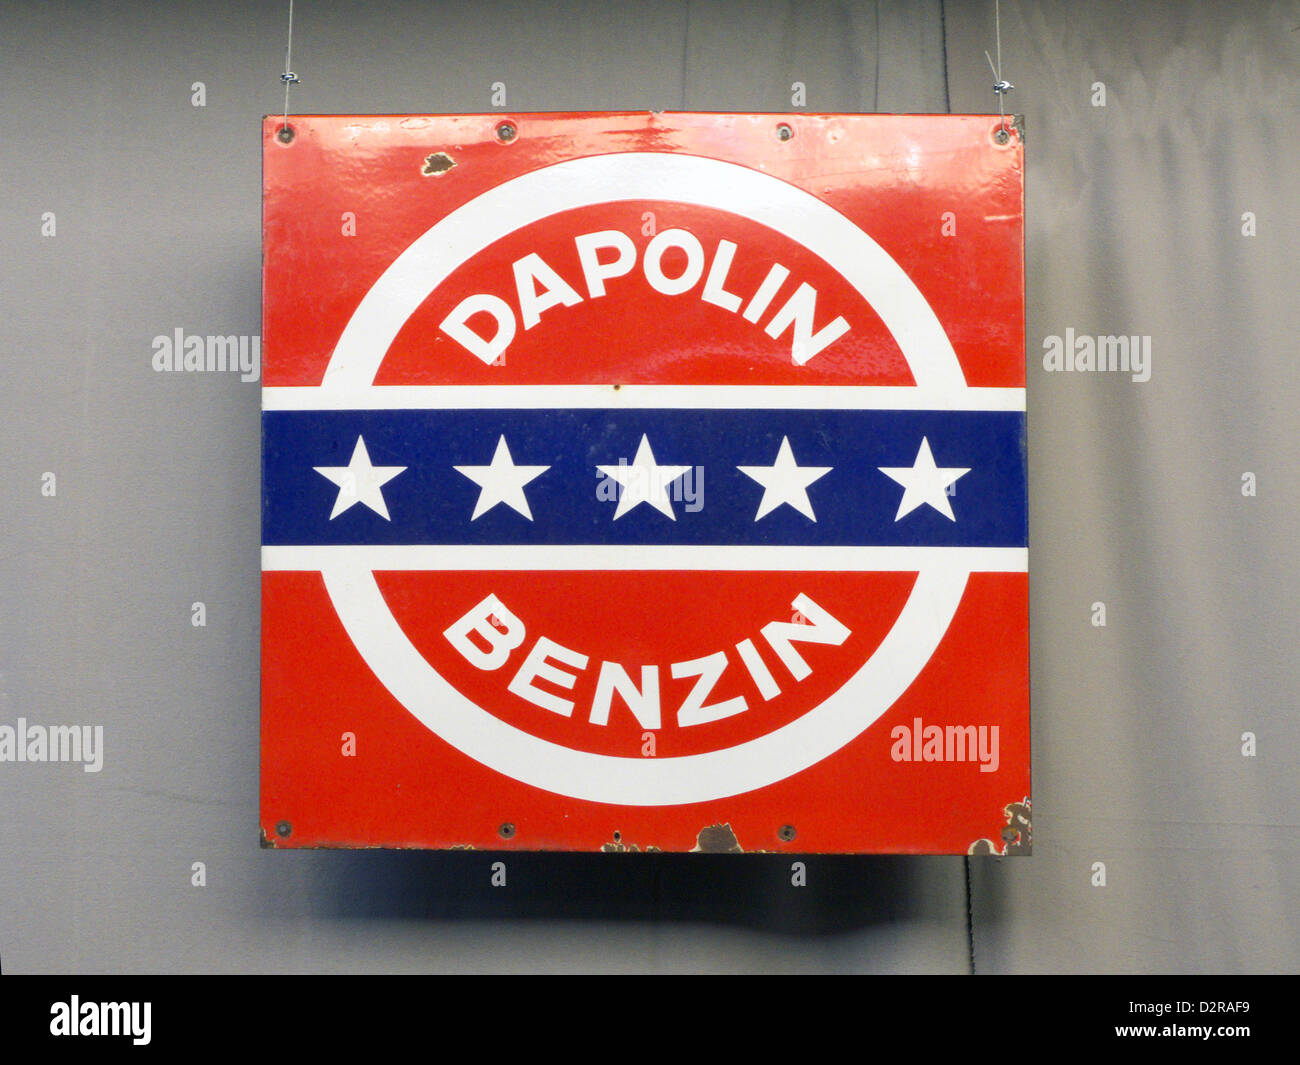 Germany Nuremberg Industry Museum nostalgic Dapolin Benzin Stock Photo